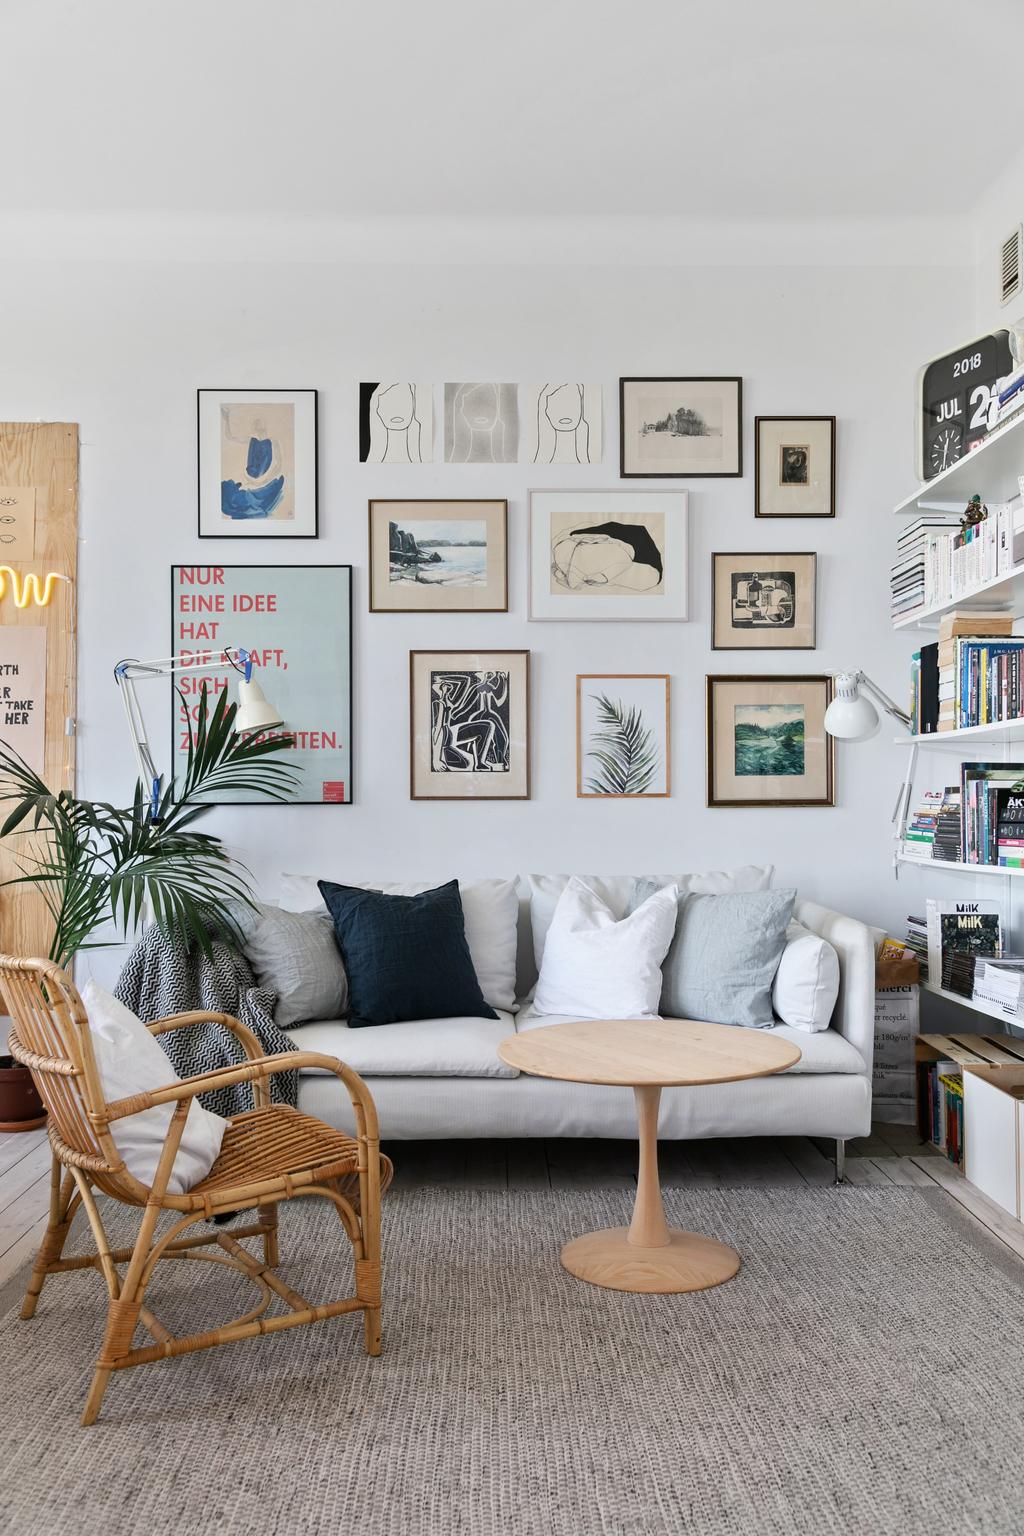 un appartement chaleureux lili in wonderland. Black Bedroom Furniture Sets. Home Design Ideas